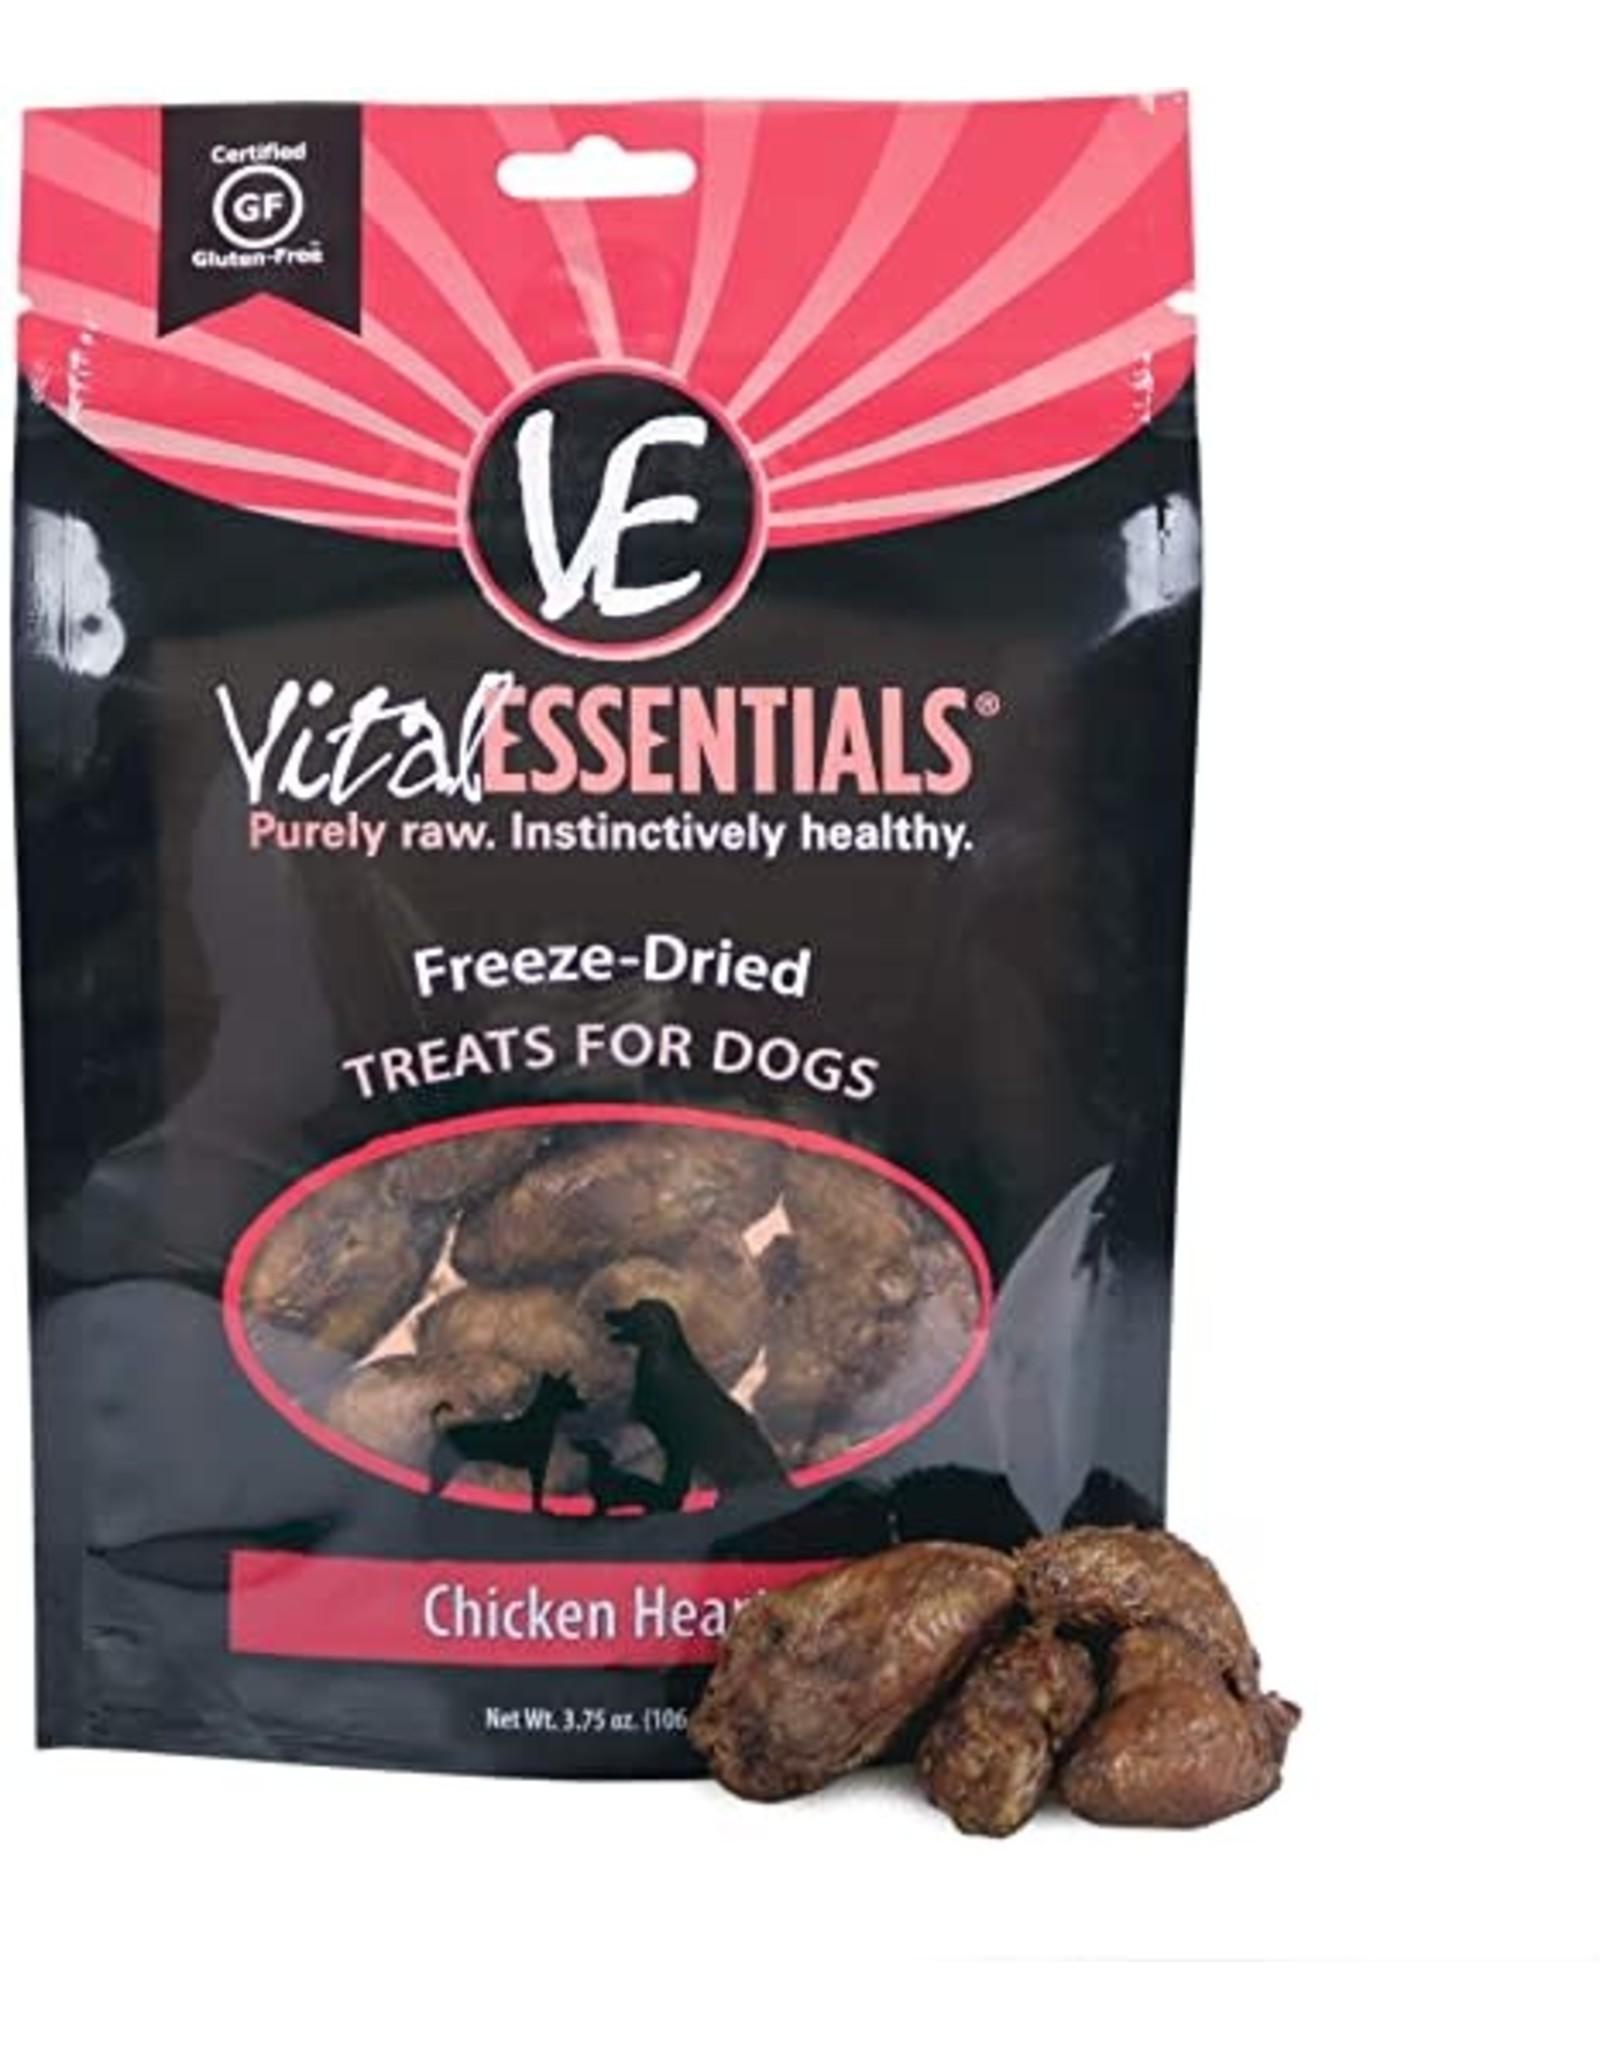 Vital Essentials VITAL ESSENTIALS FREEZE DRIED CHICKEN HEART TREATS FOR DOGS 2OZ